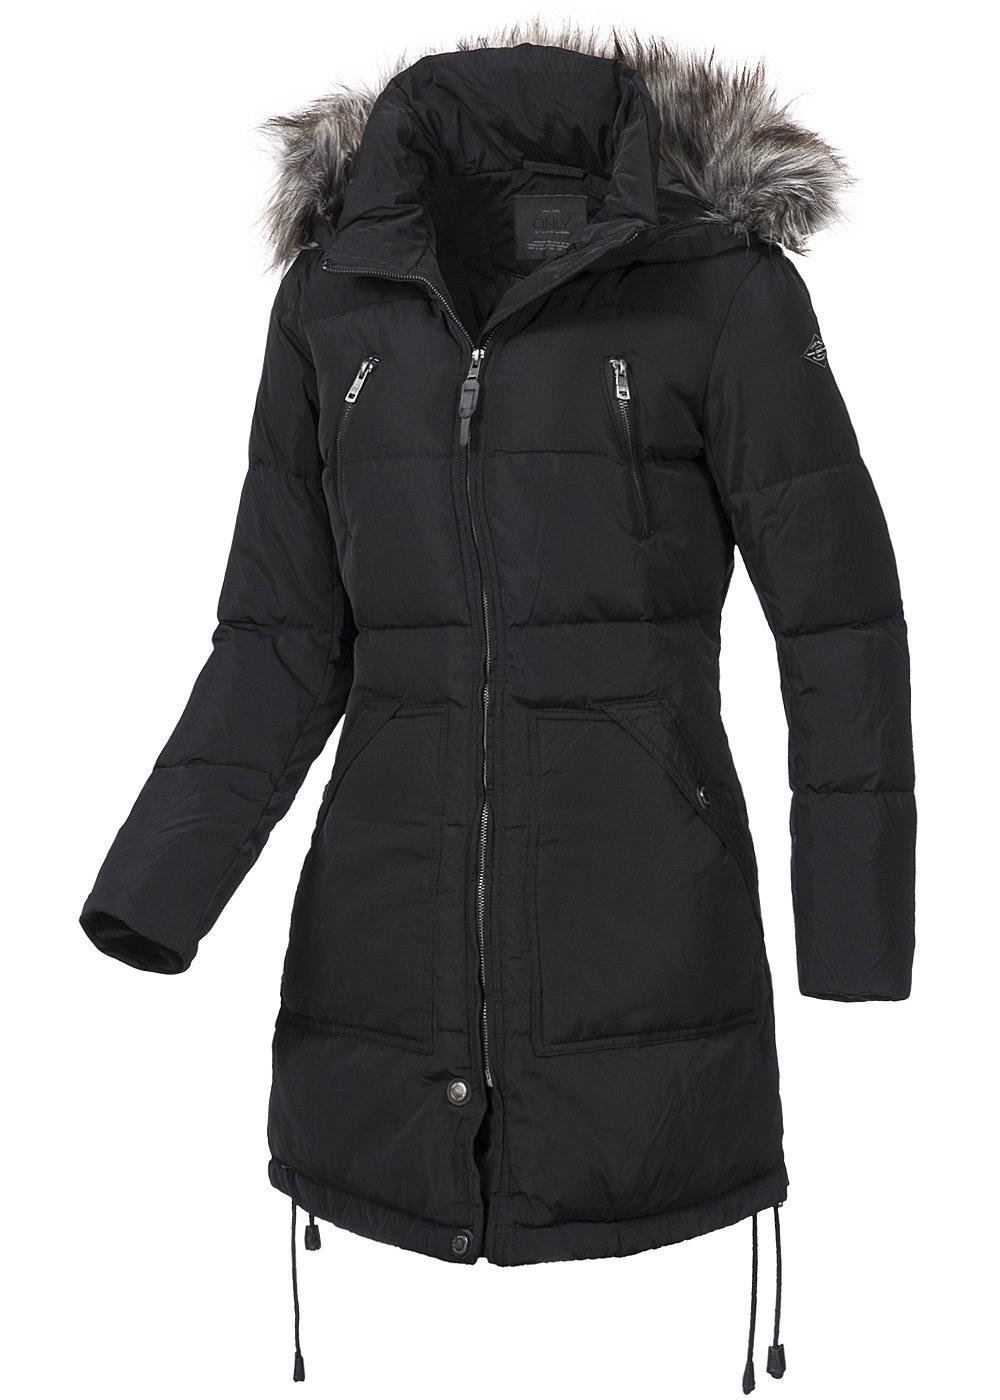 Only Damen Winter Mantel Lana 15102375 2 Taschen Abn Kapuze